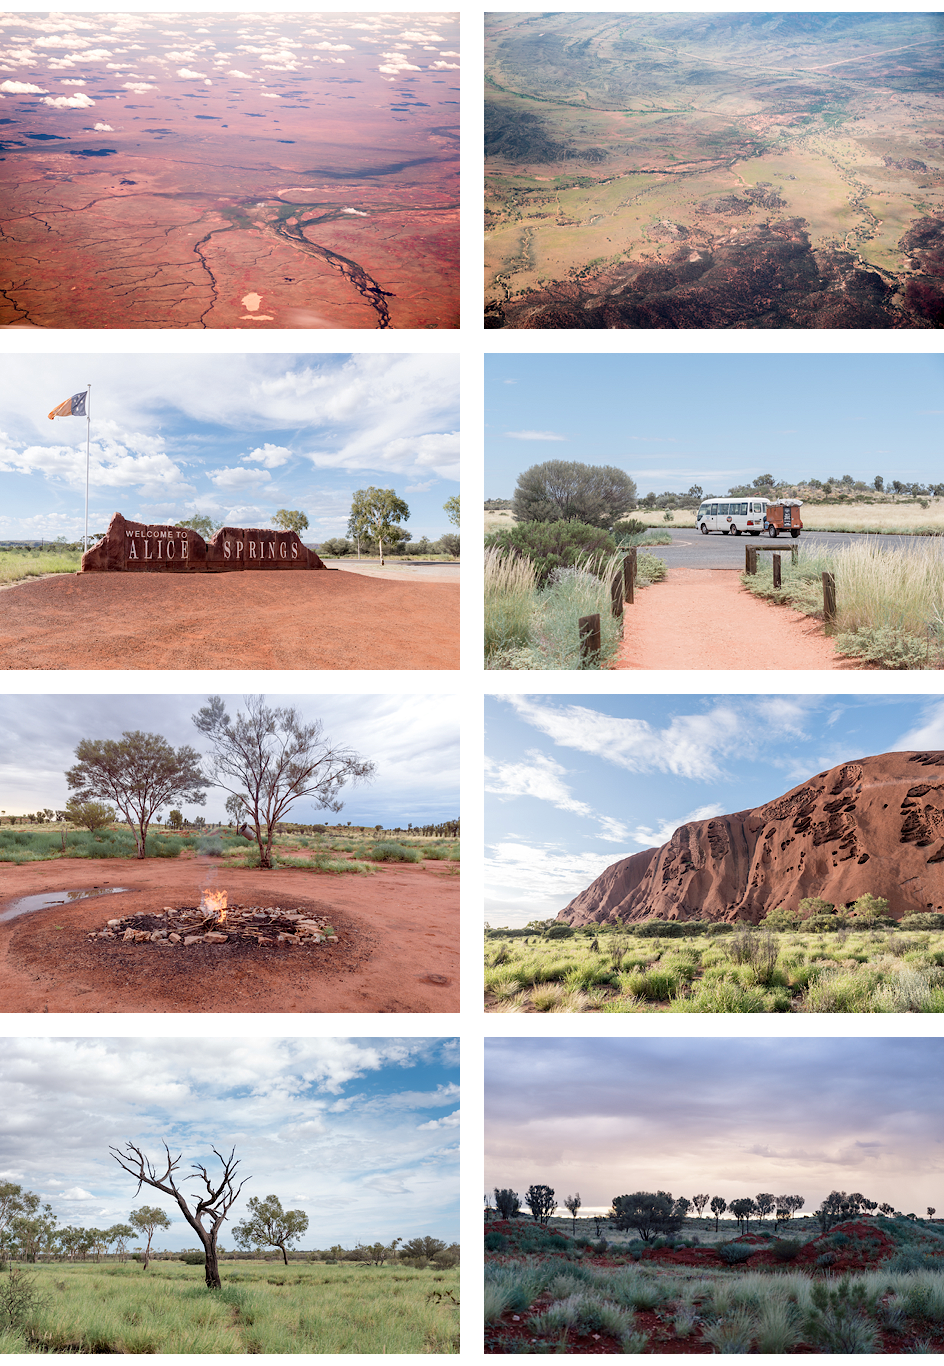 Flug ins Outback, Alice Springs, unser Tour-Bus, unser Schlafplatz, Uluru, Nationalpark